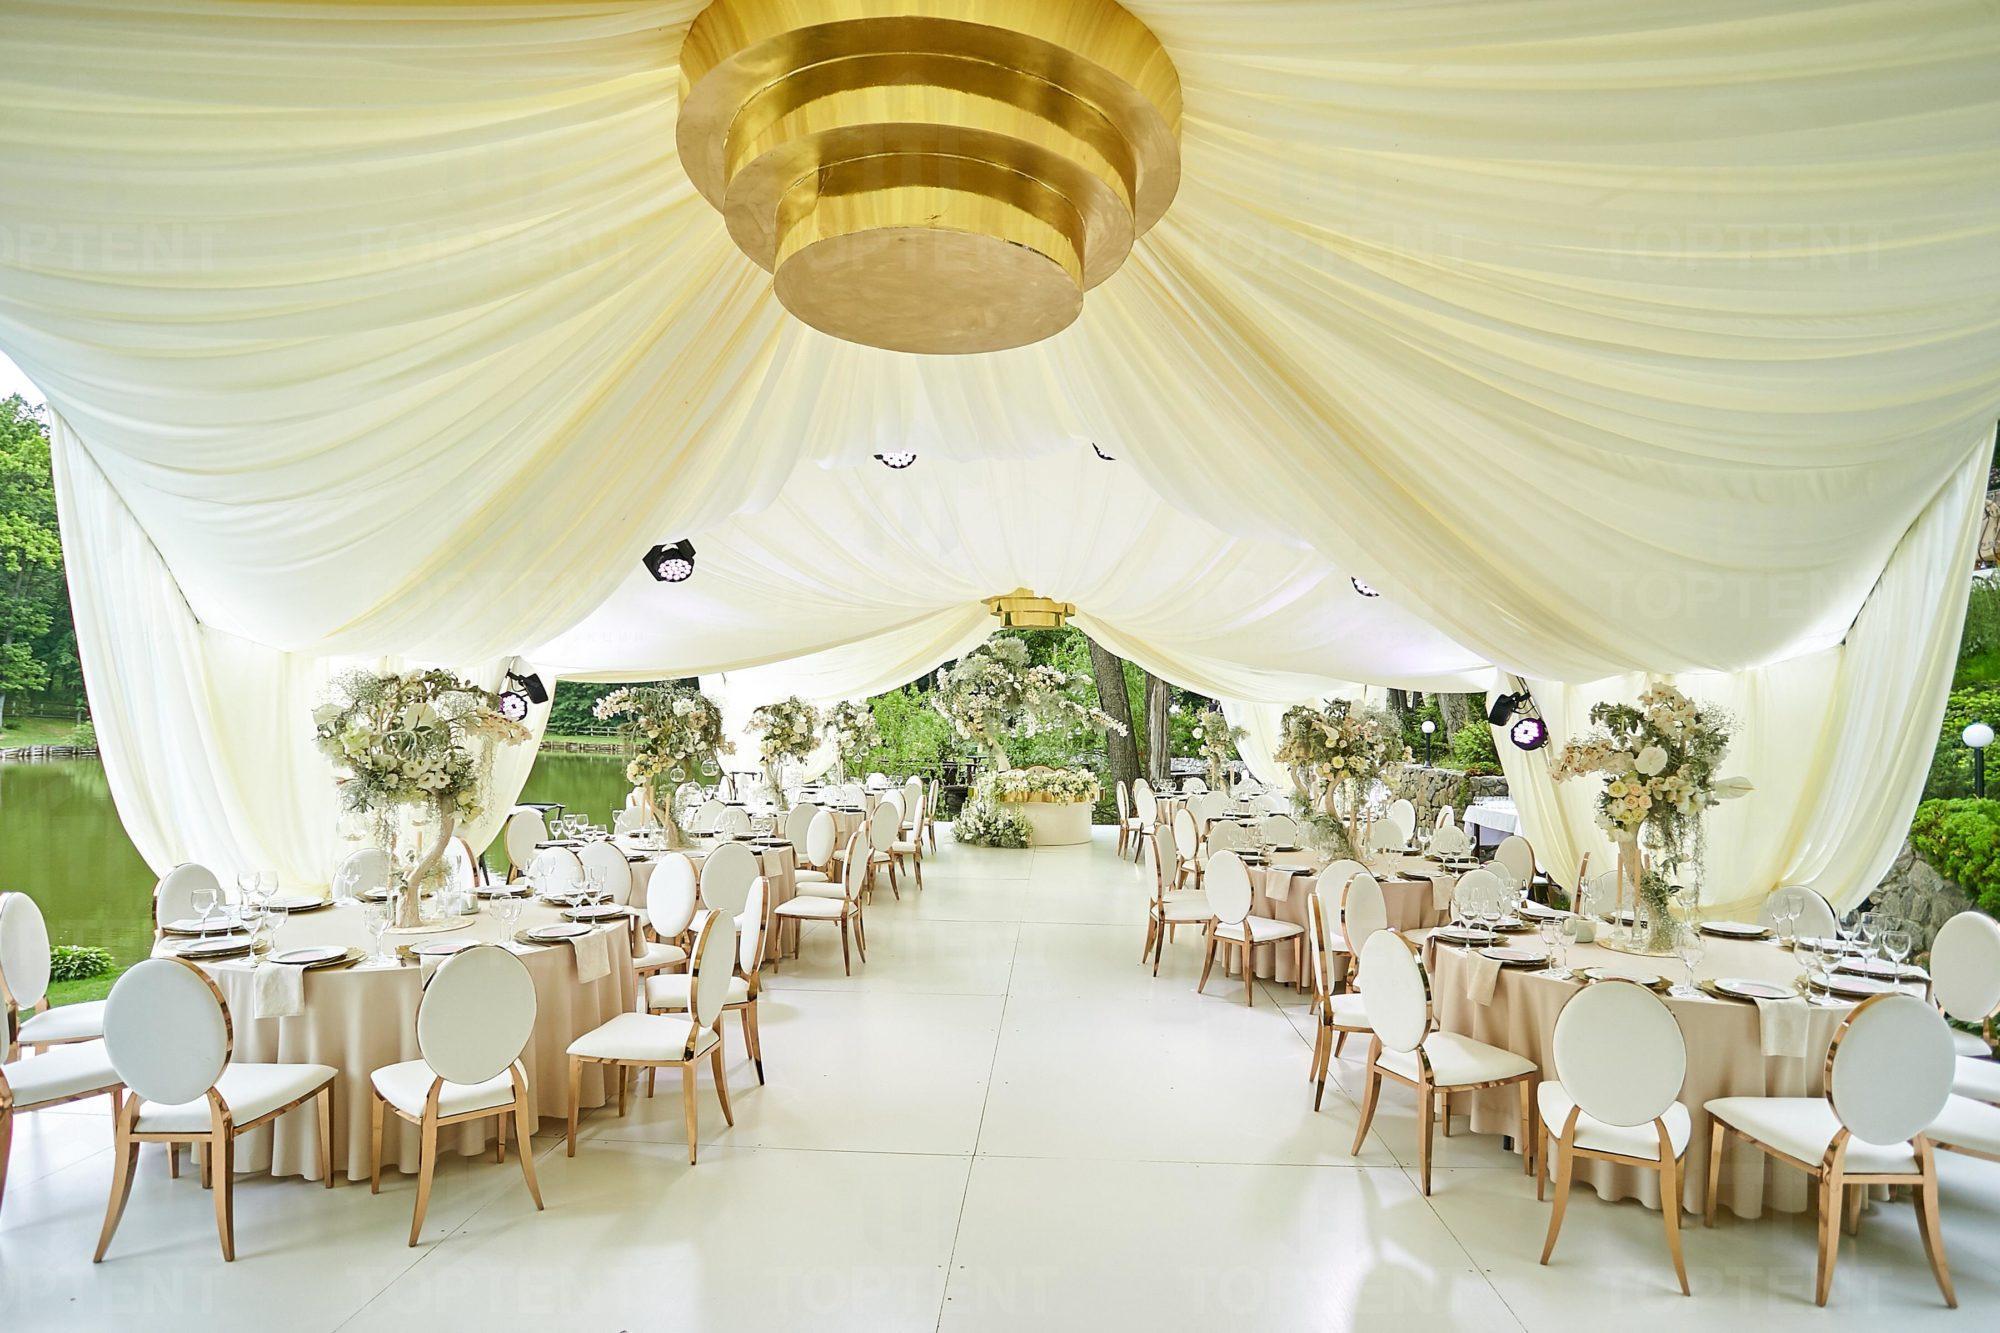 шатер для свадьбы фото